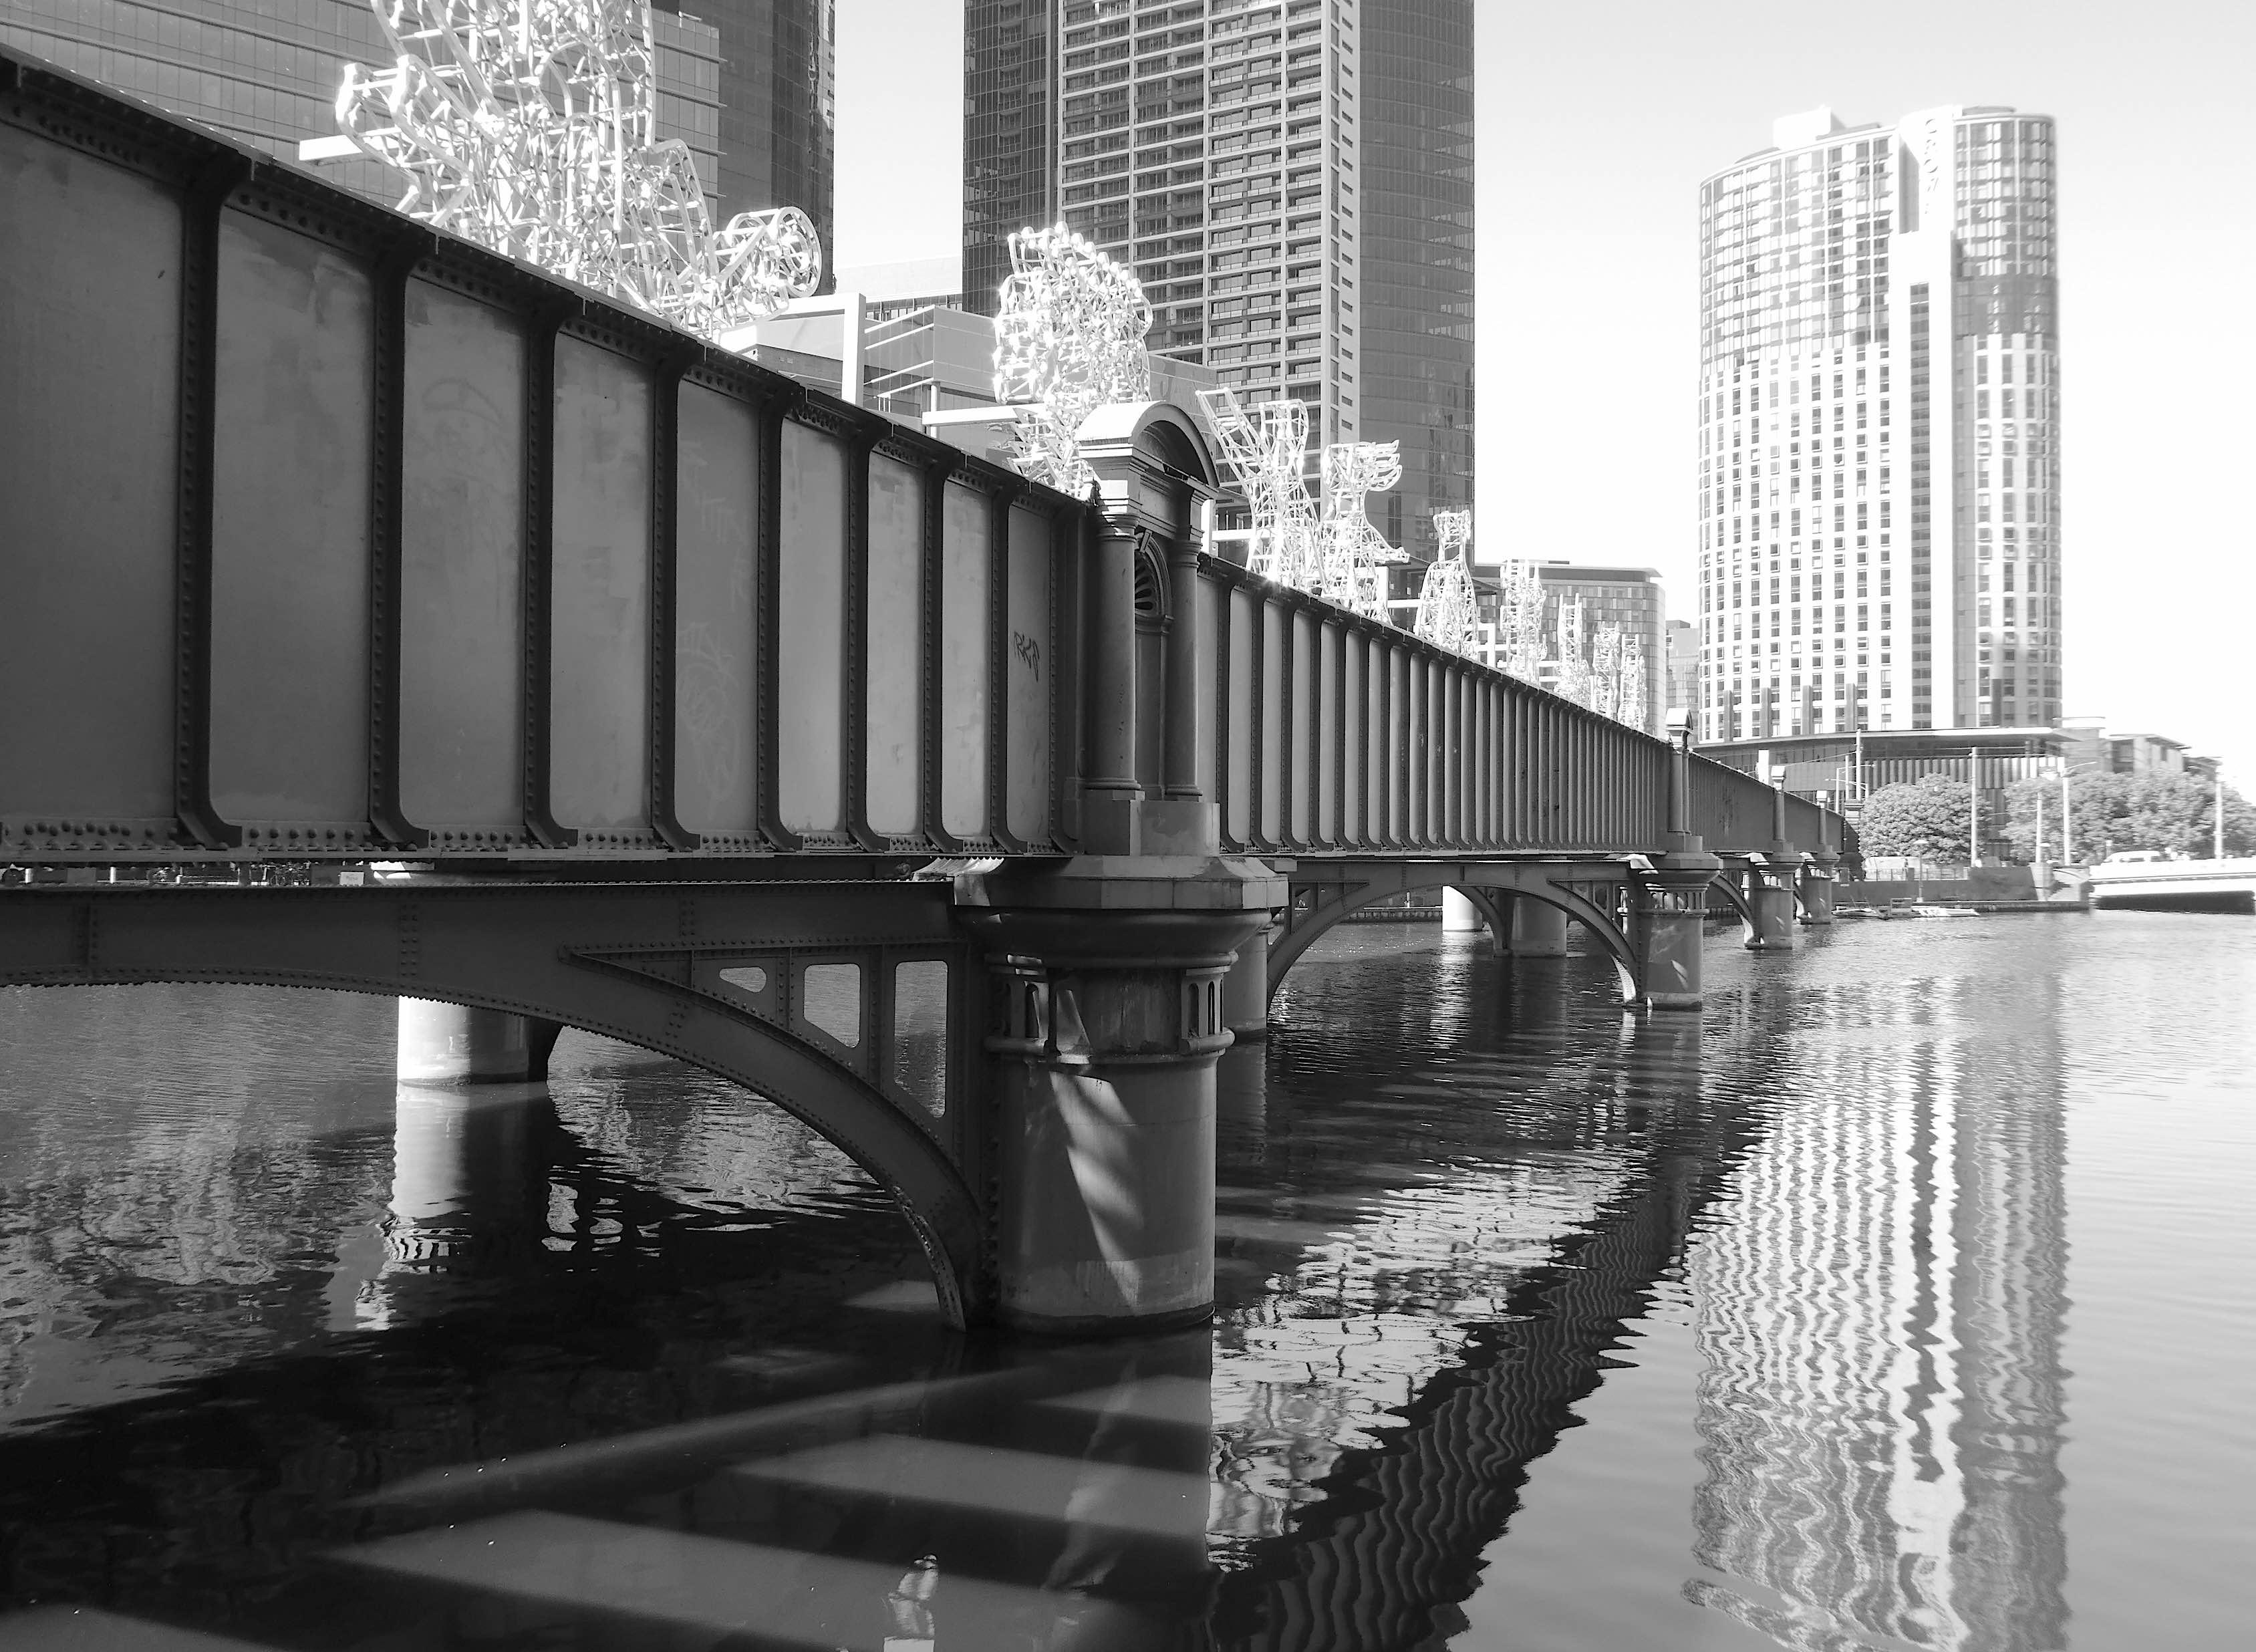 13.Sandridge Bridge